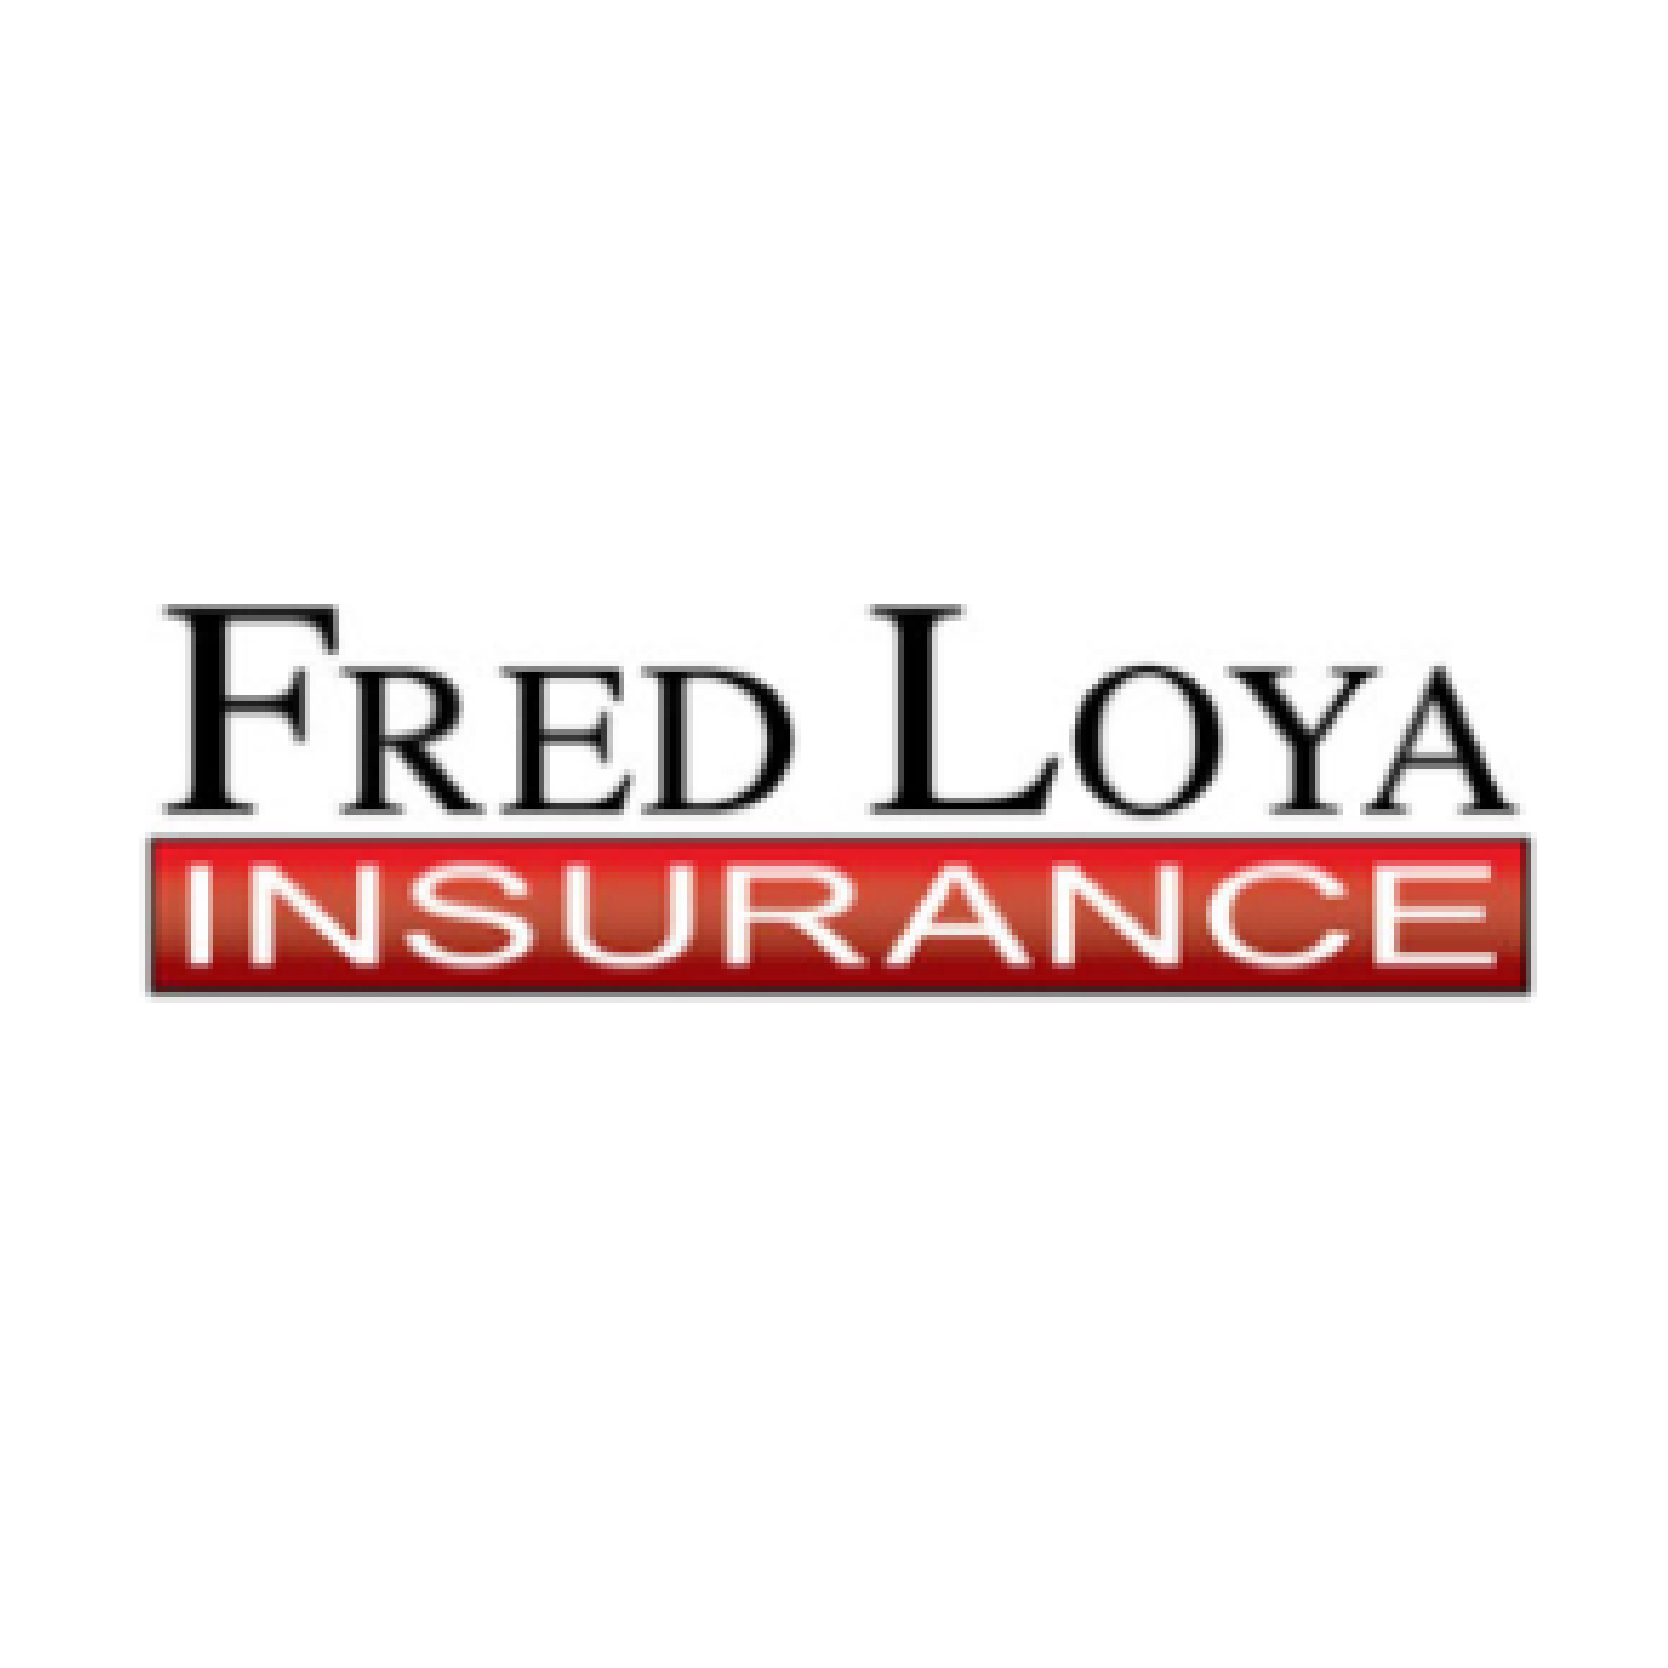 Fred Loya/Rodney D. Young Insurance